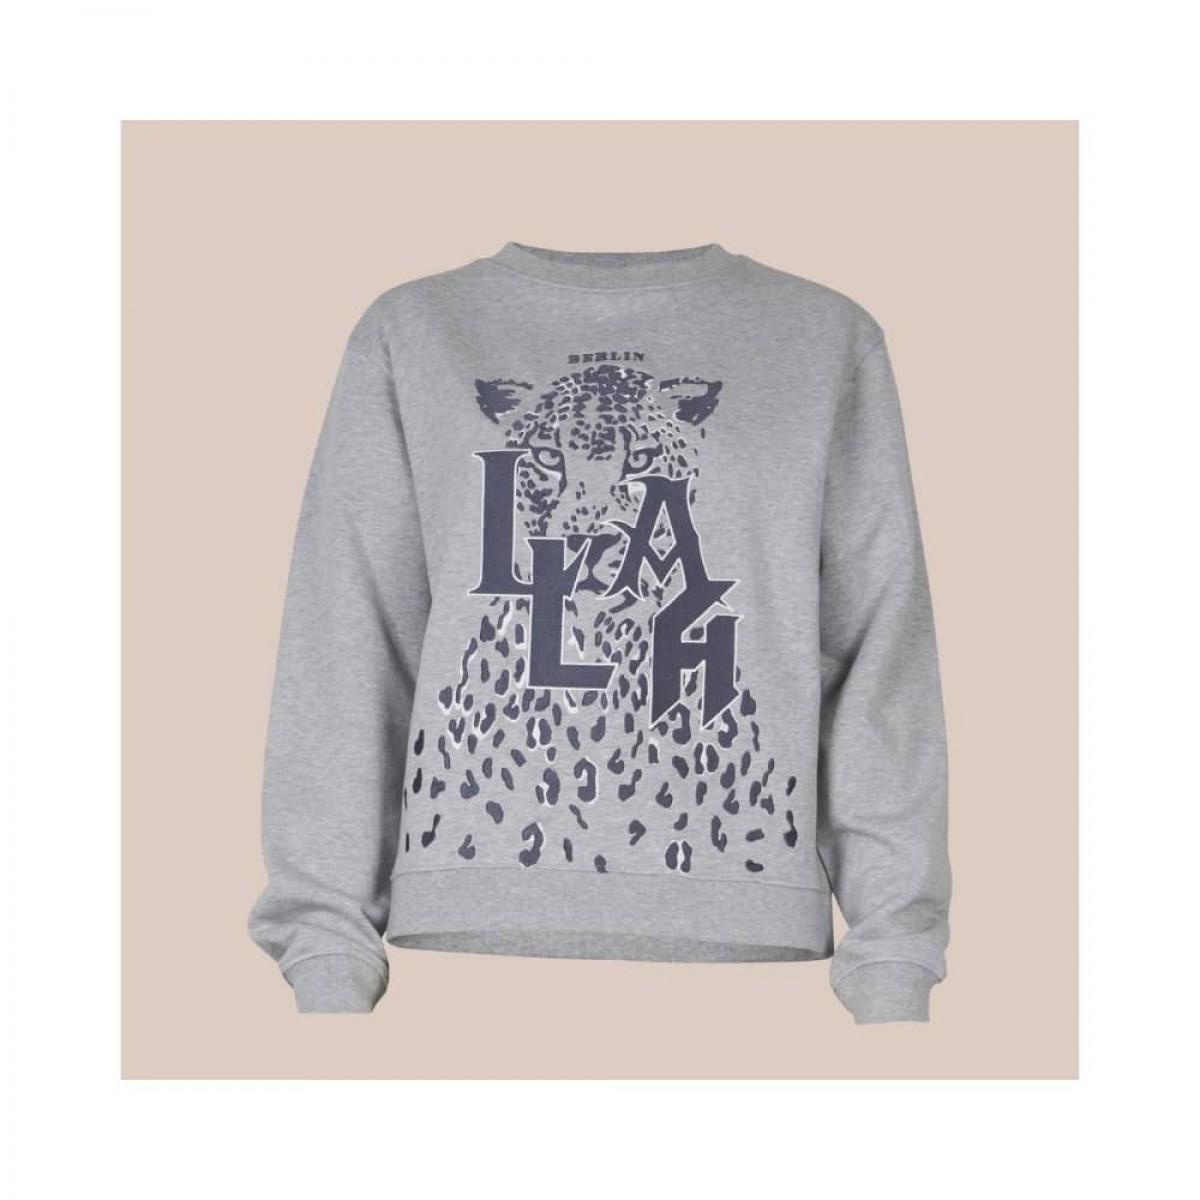 irya leo sweatshirt - grey melange - front